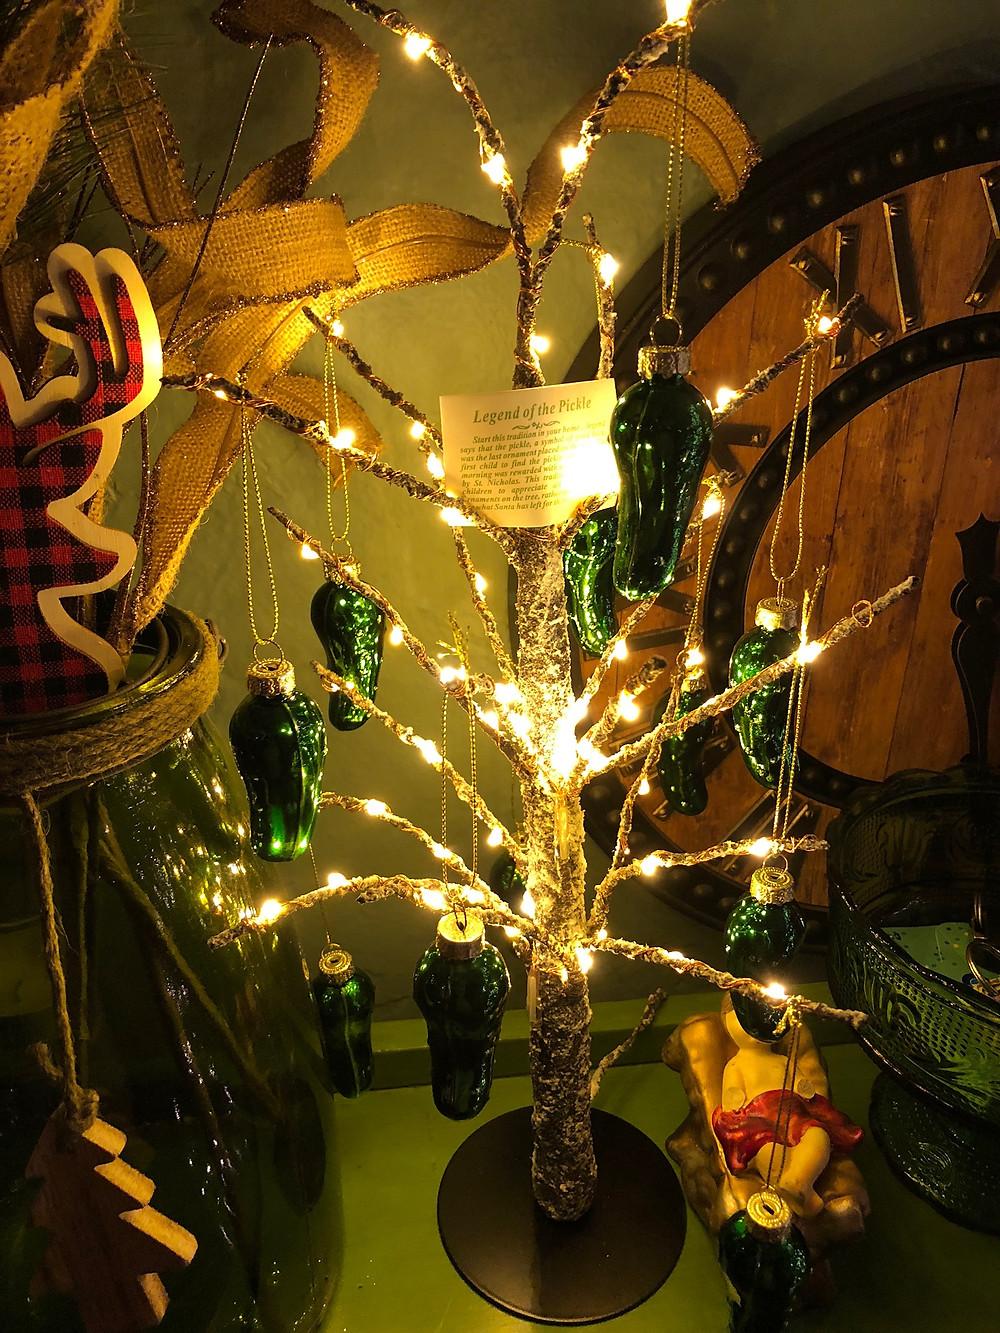 Alycia Yerves home Christmas decor 2017 Christmas tree of pickles